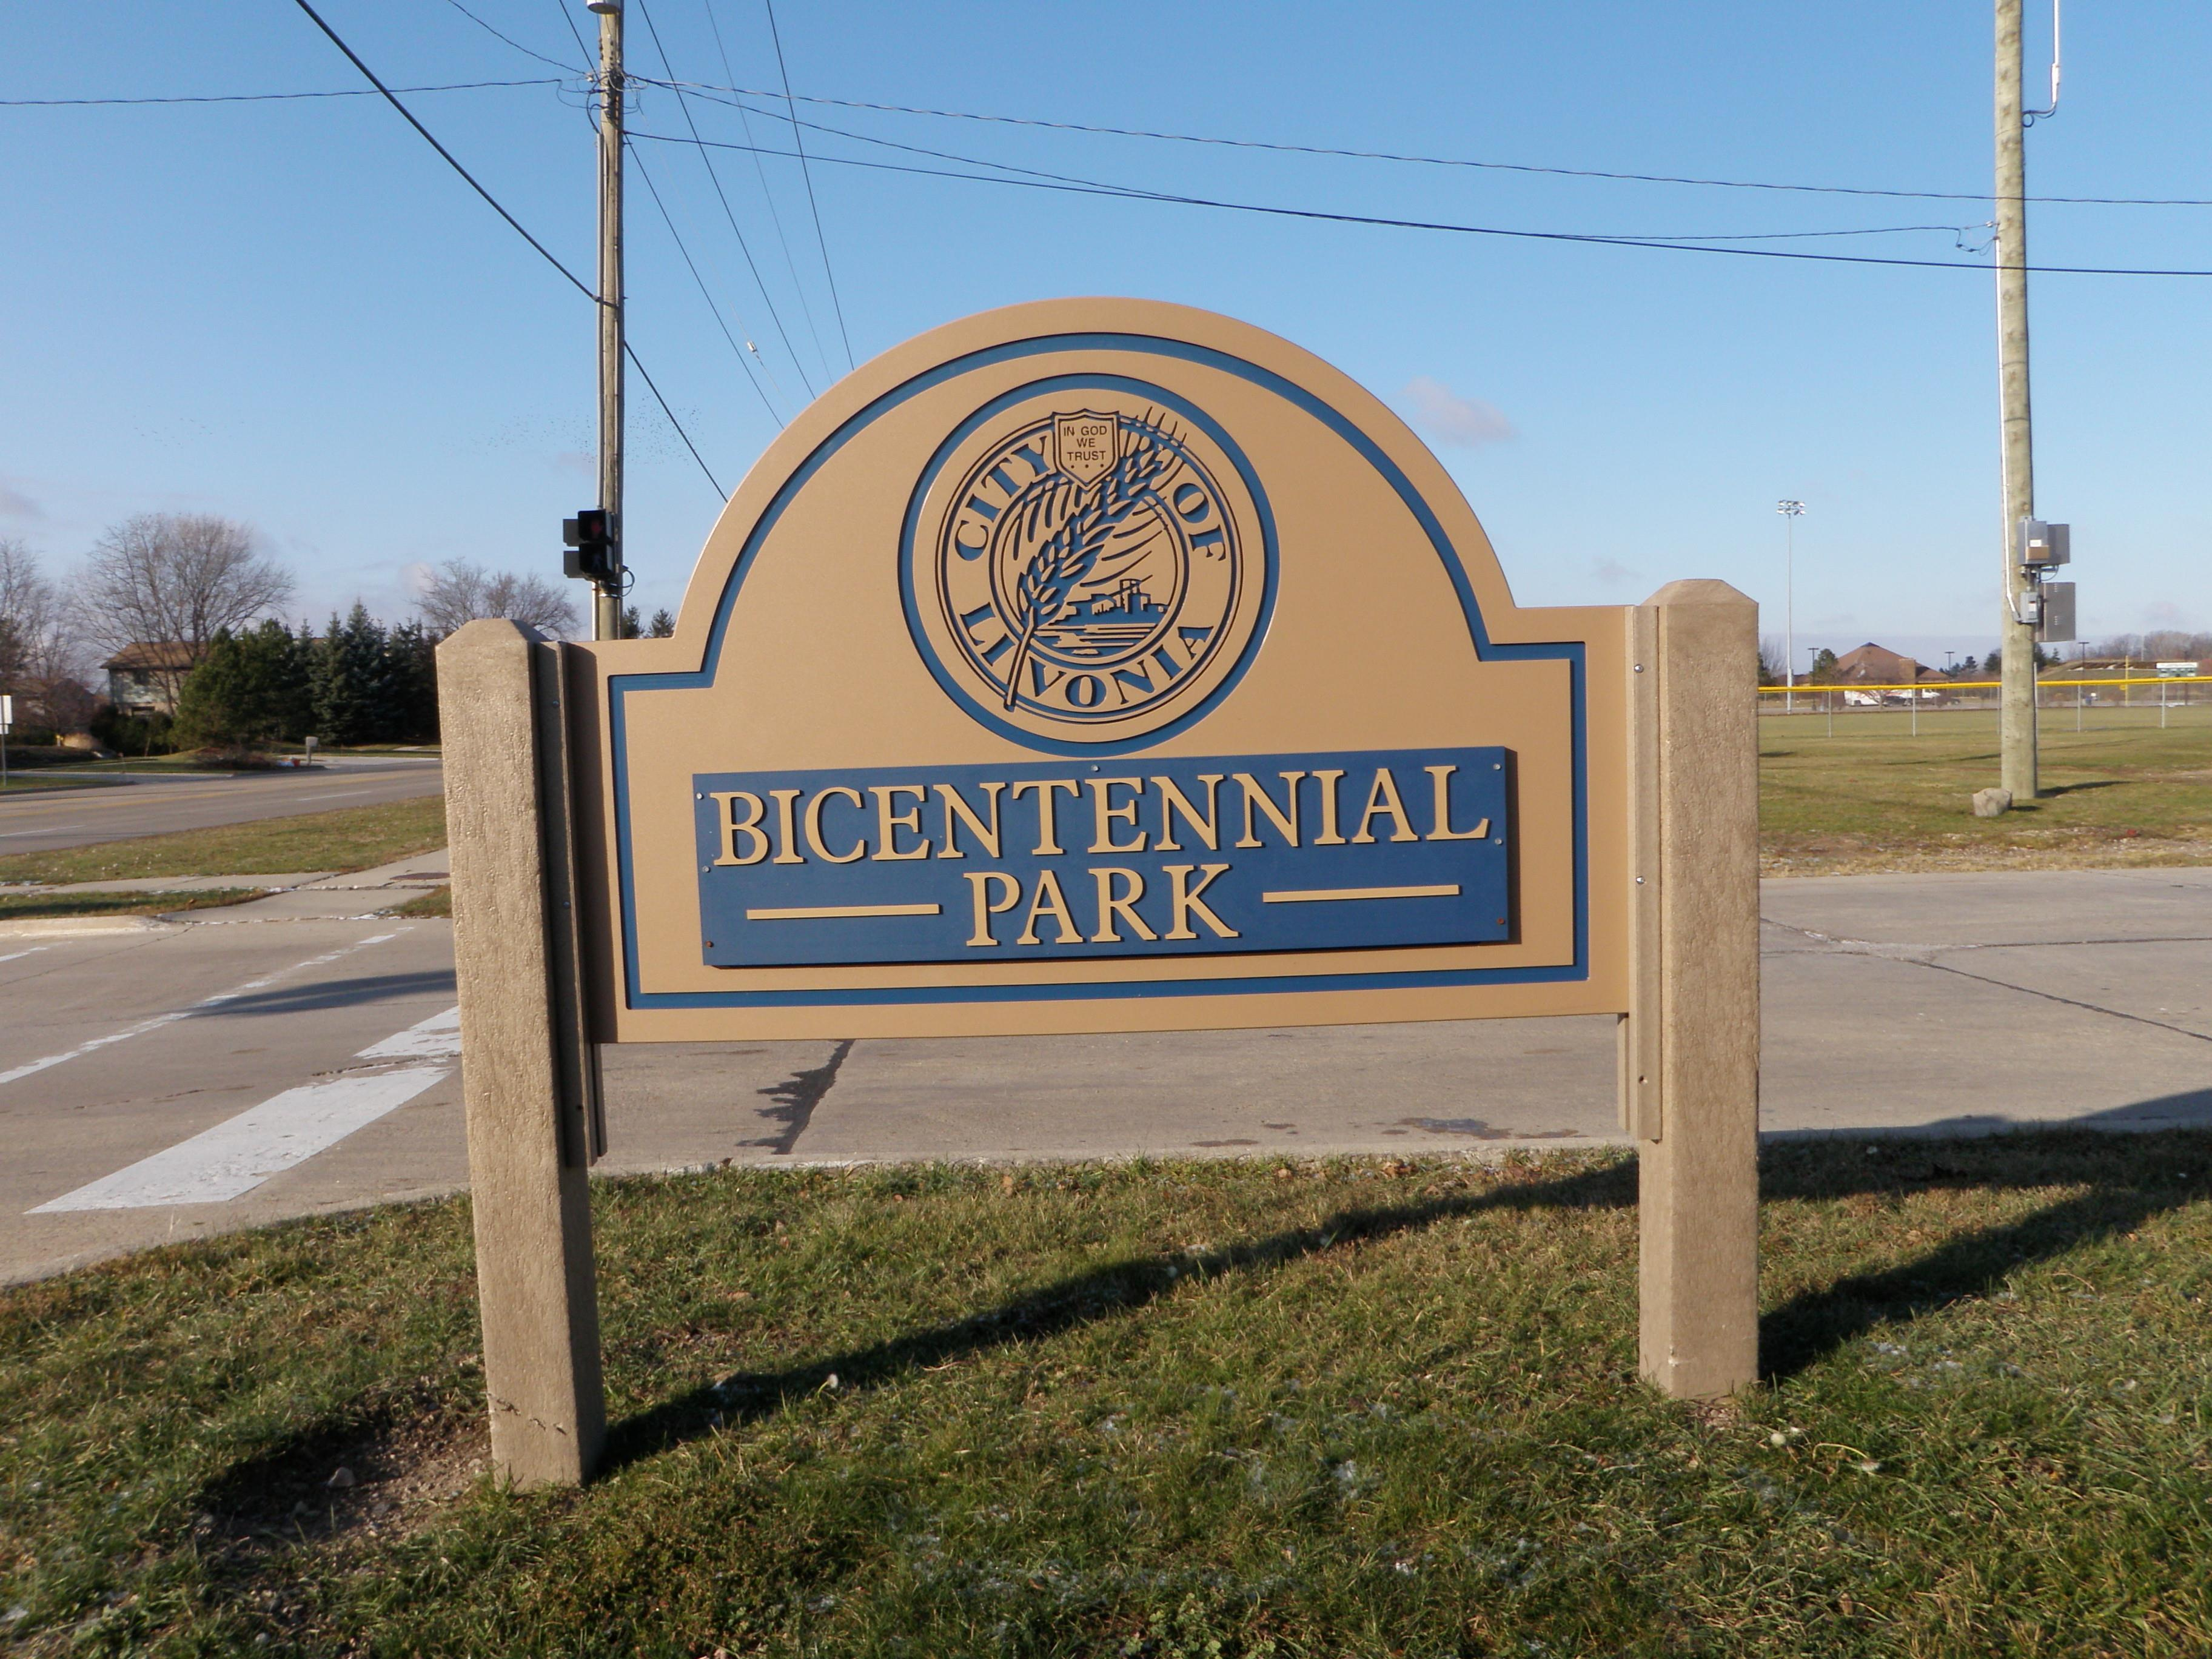 Bicentennial Park Livonia Michigan